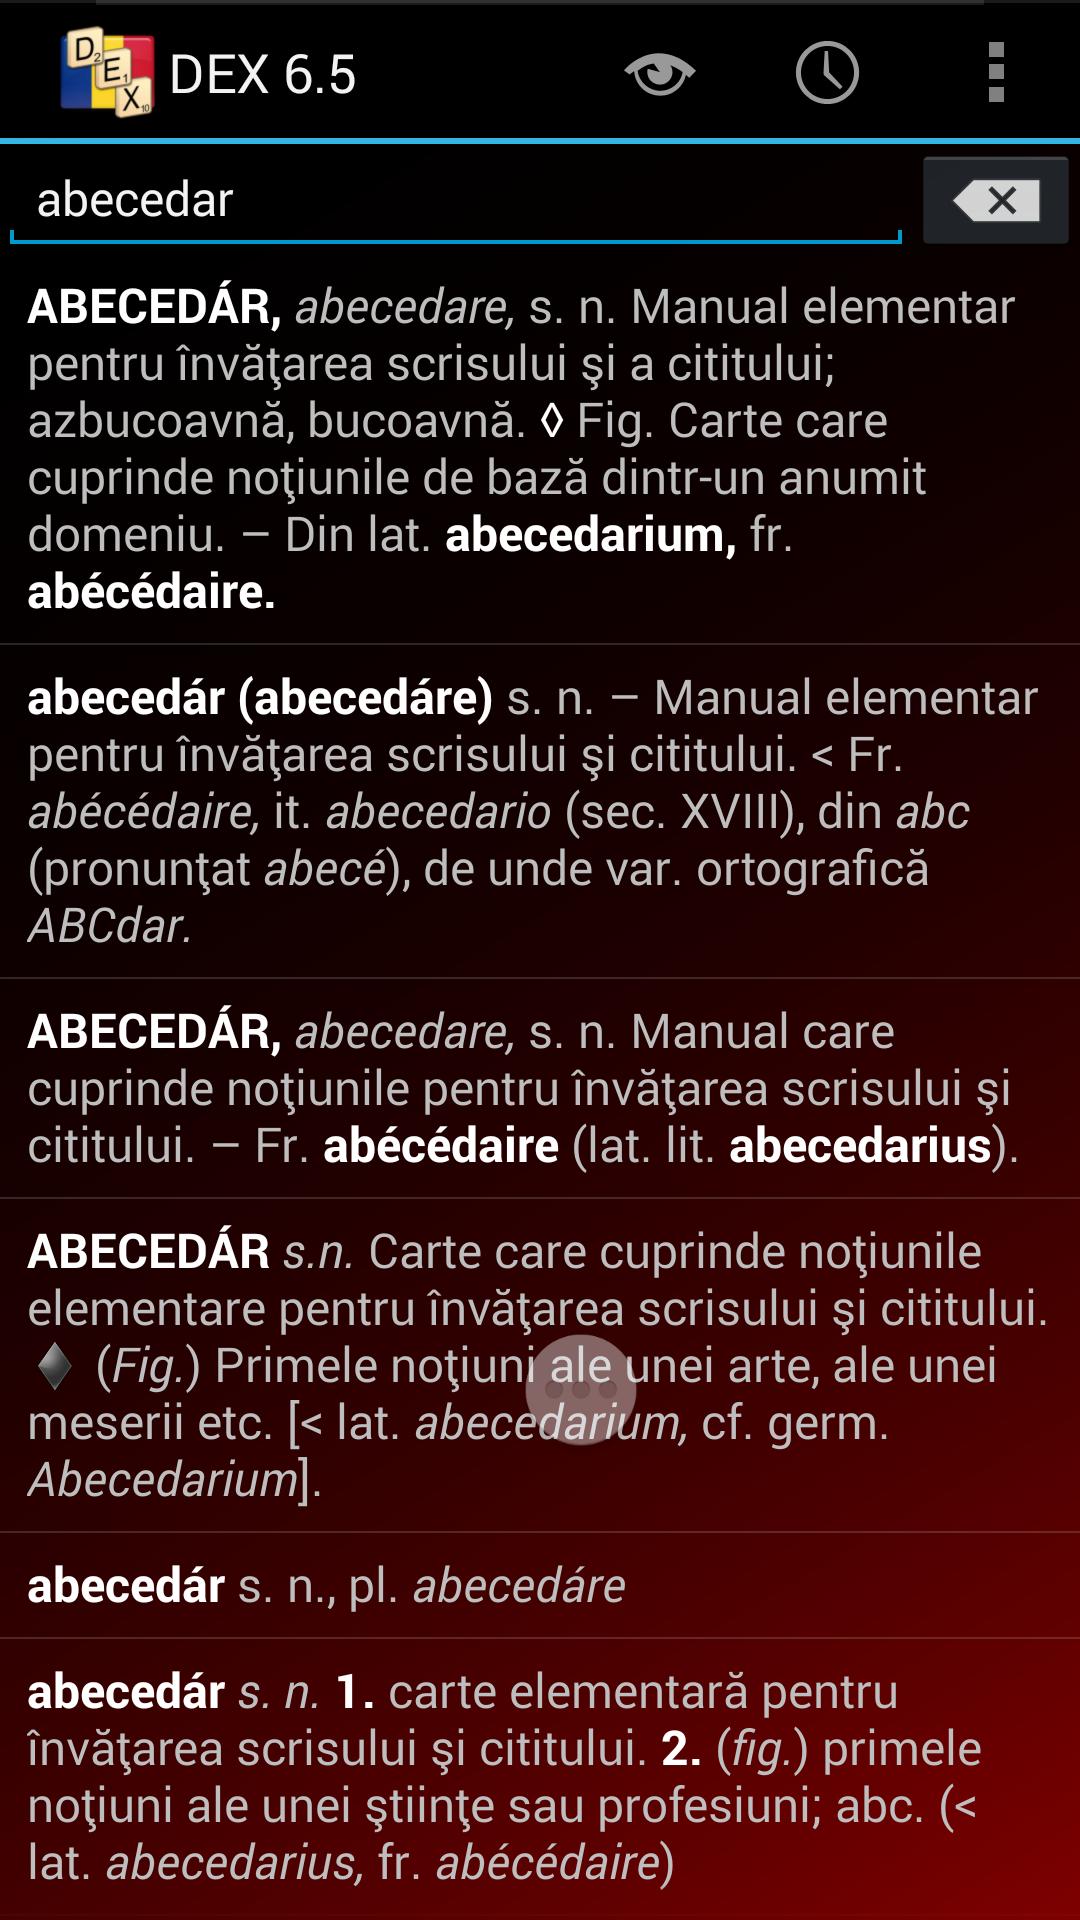 DEX aplicaţie Android